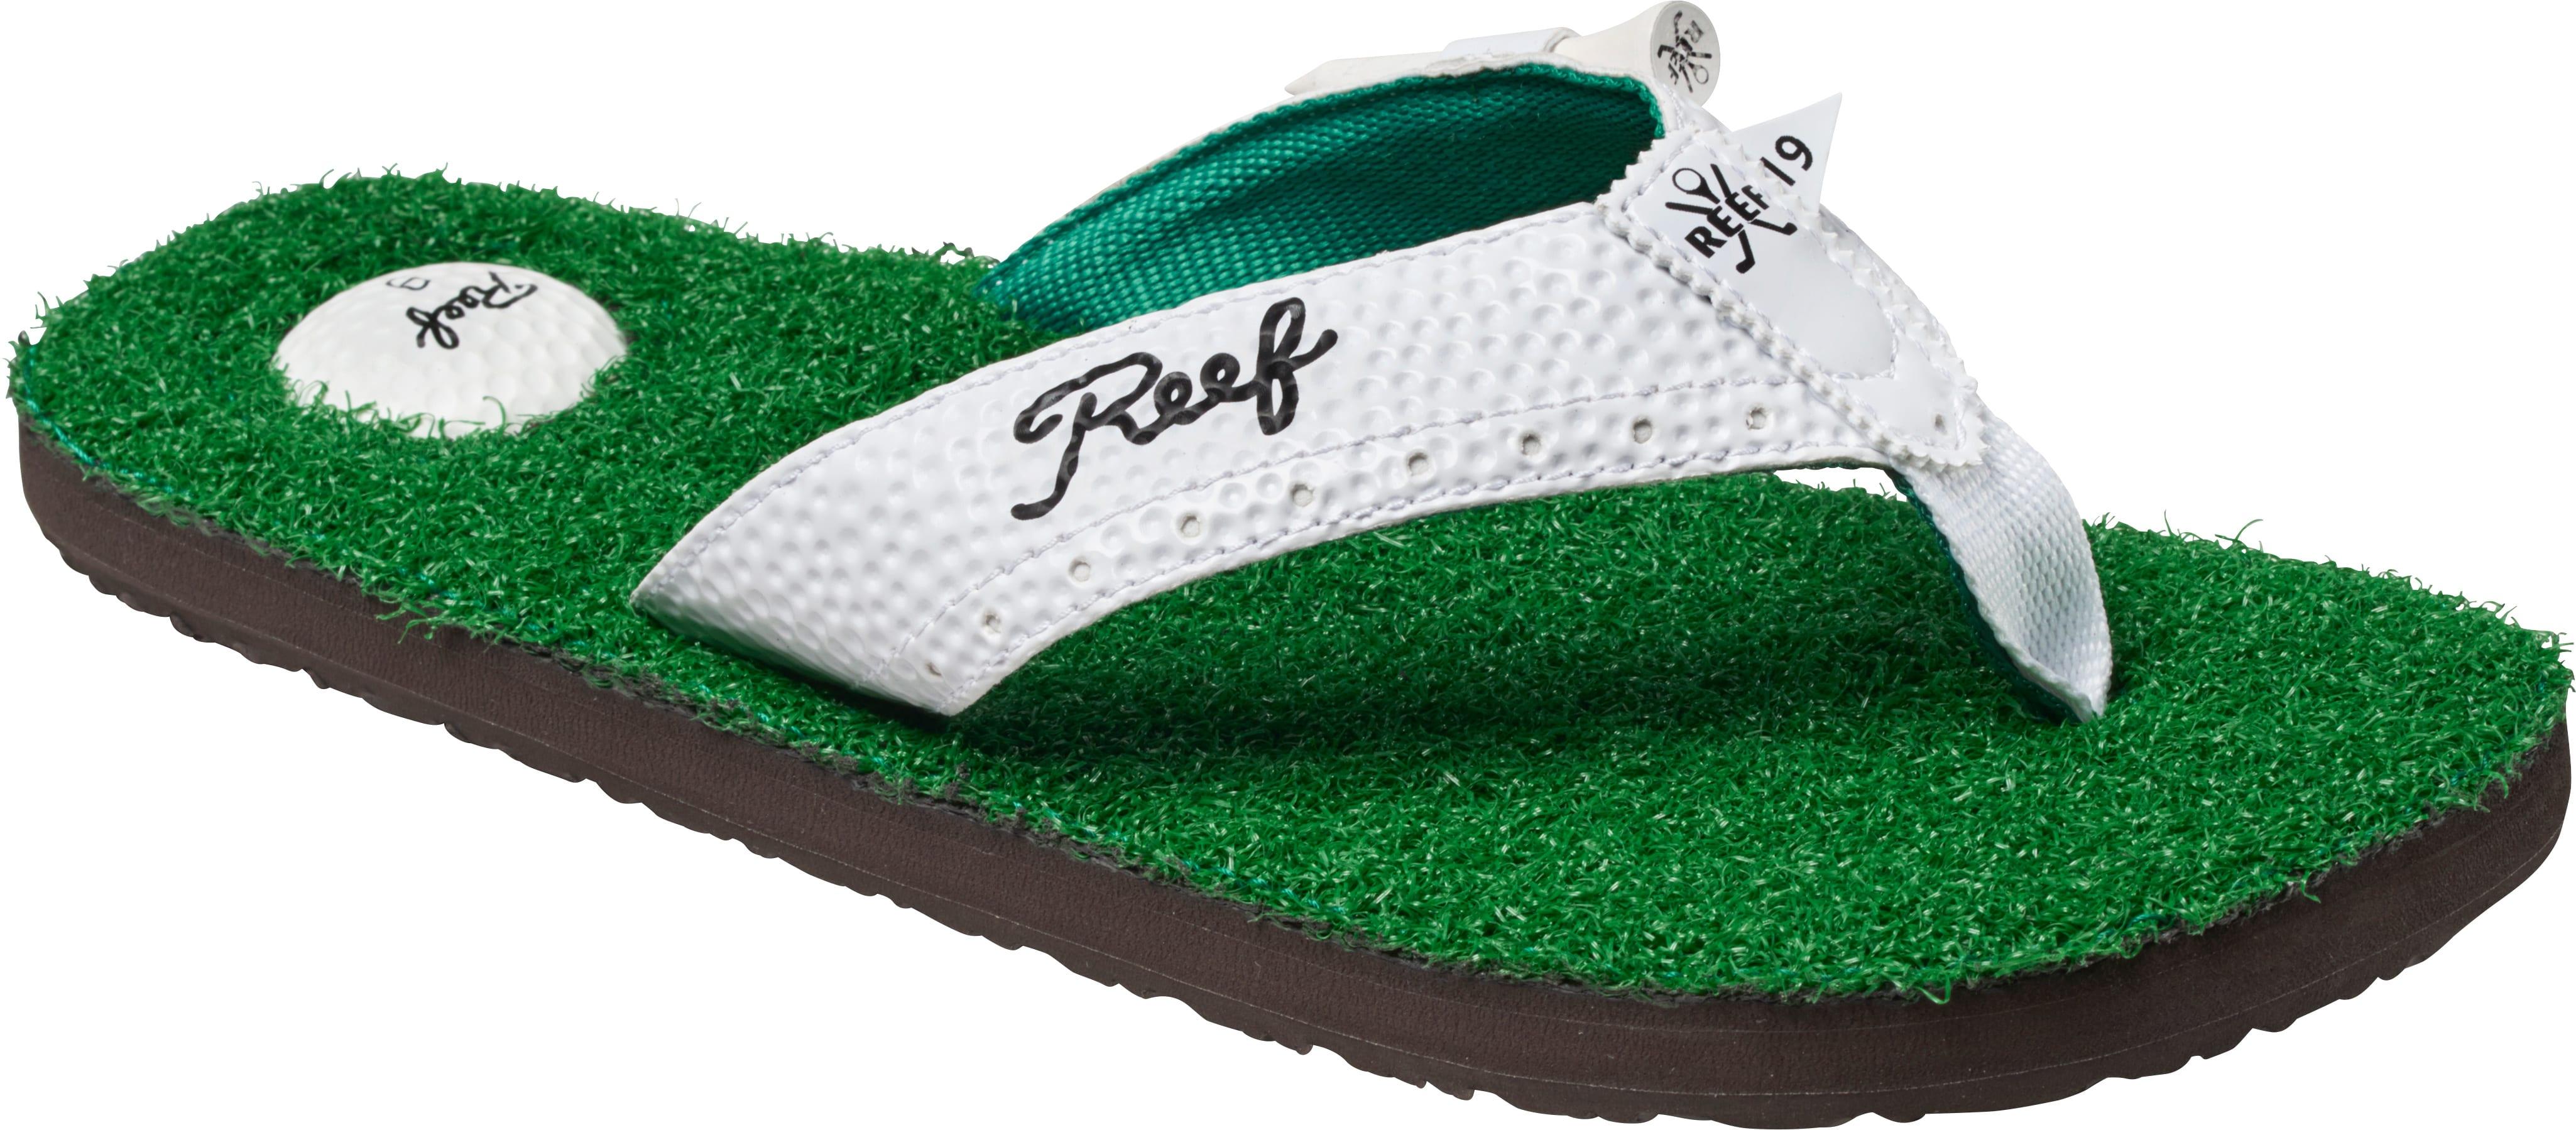 258c82fe9d1 Reef Mulligan II Sandals - thumbnail 2